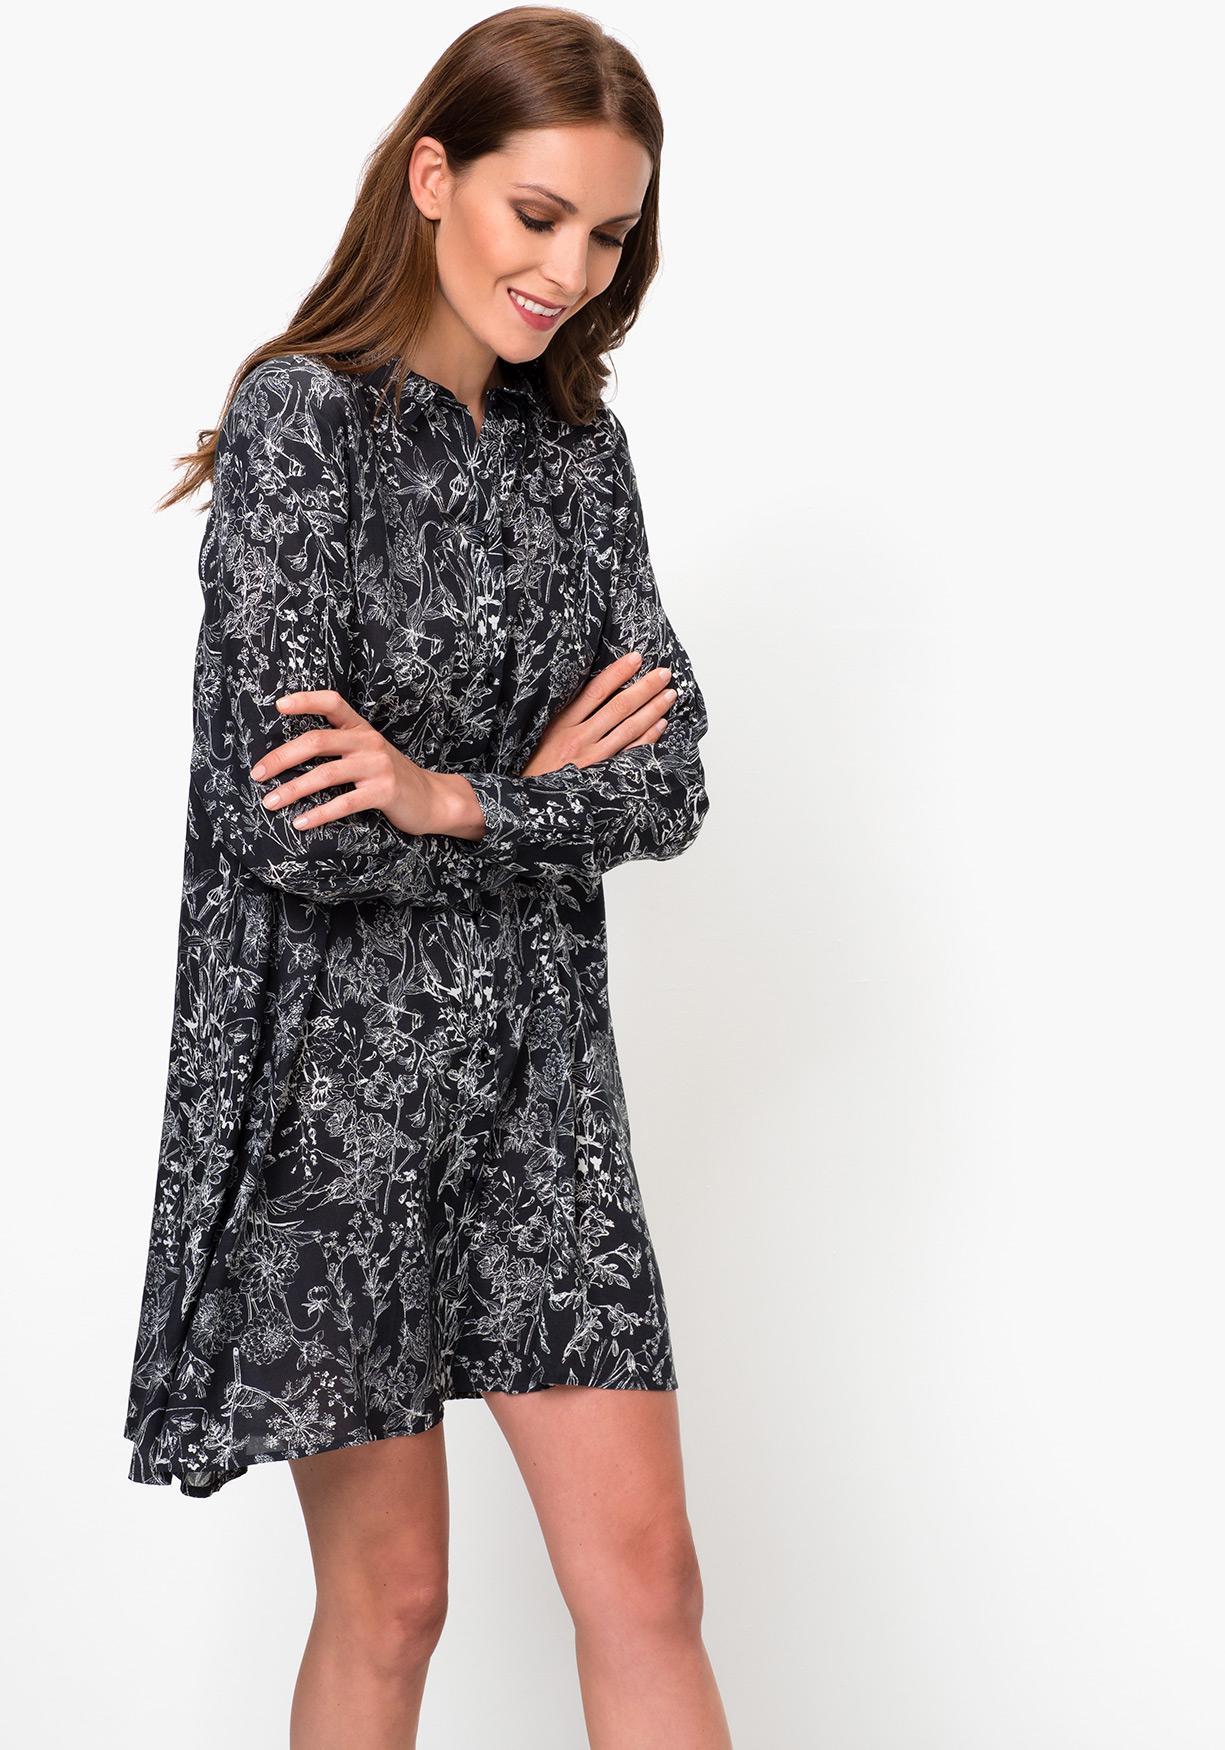 a771a6ff Comprar Vestido de mujer con manga larga TEX. ¡Aprovéchate de ...